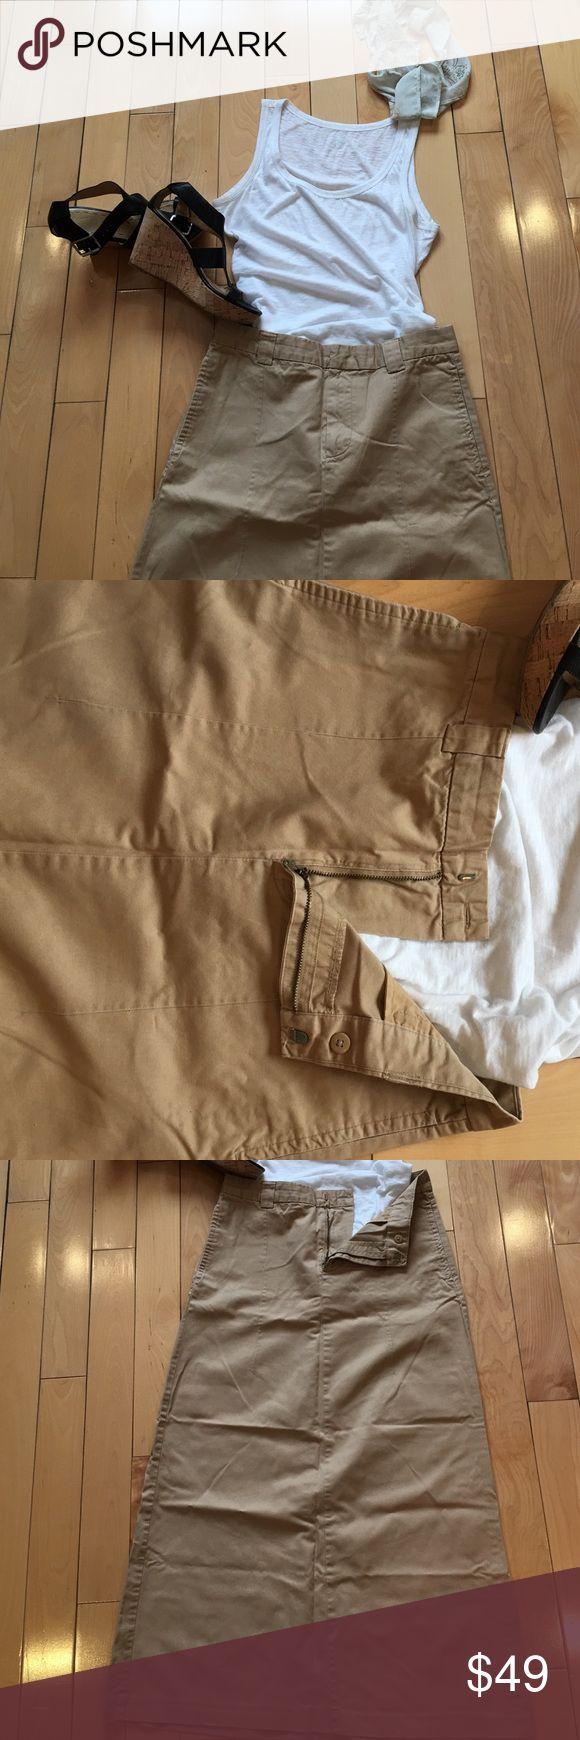 Khaki camel maxi skirt 6 Pretty cotton gap maxi skirt. Versatile color. Dress up or down    Blazer or tank and flip flops. GAP Skirts Maxi